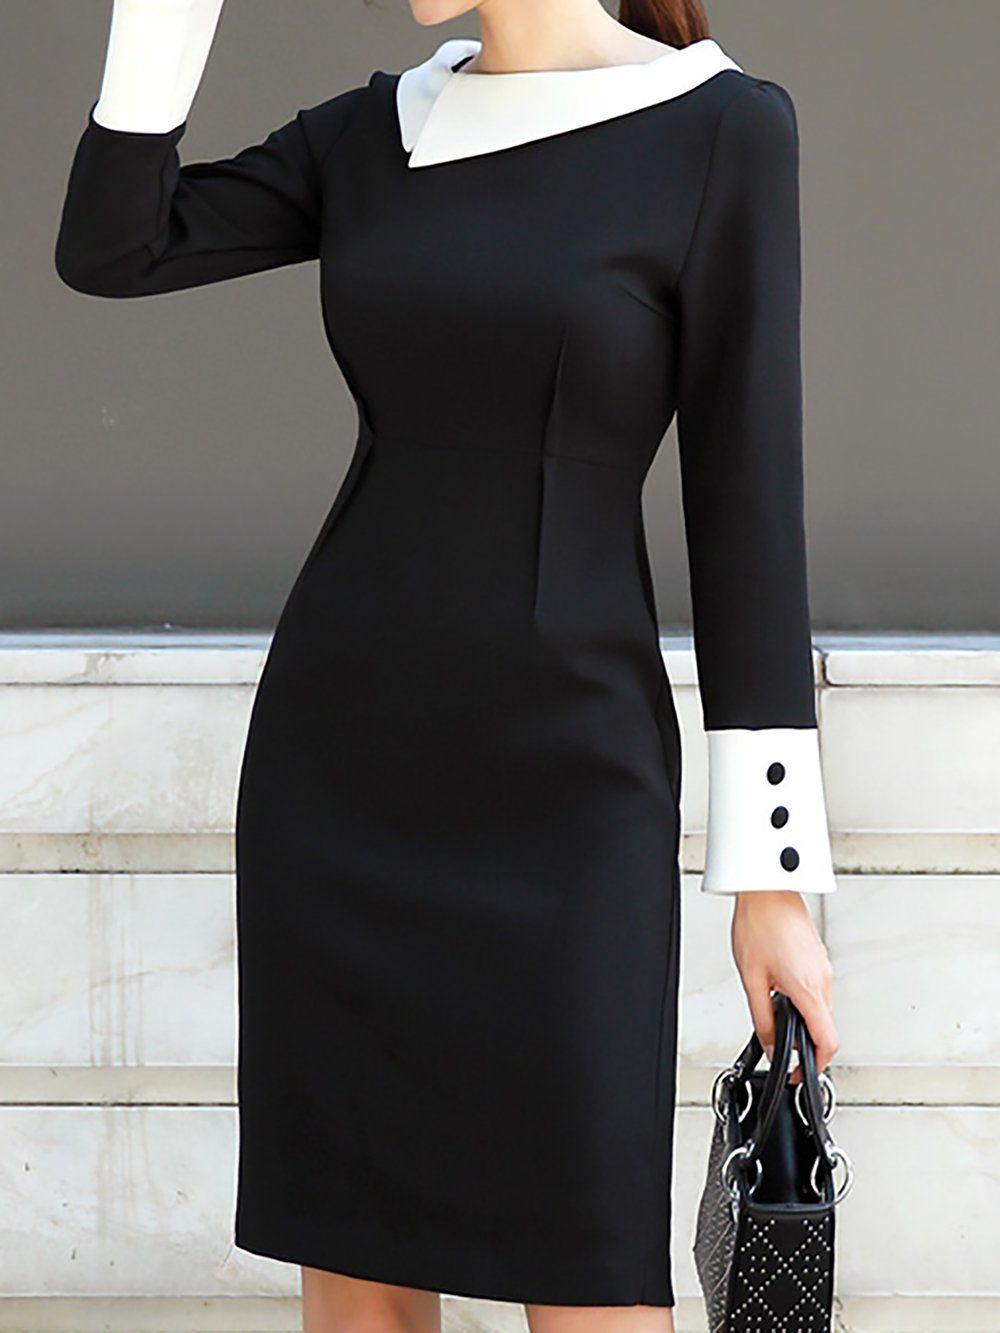 /Sexy Fashion/ Women Long/ Sleeve/ Slim/ Fold/ Bodycon Cocktail Party Mini Dress Pandaie-Womens Dresses